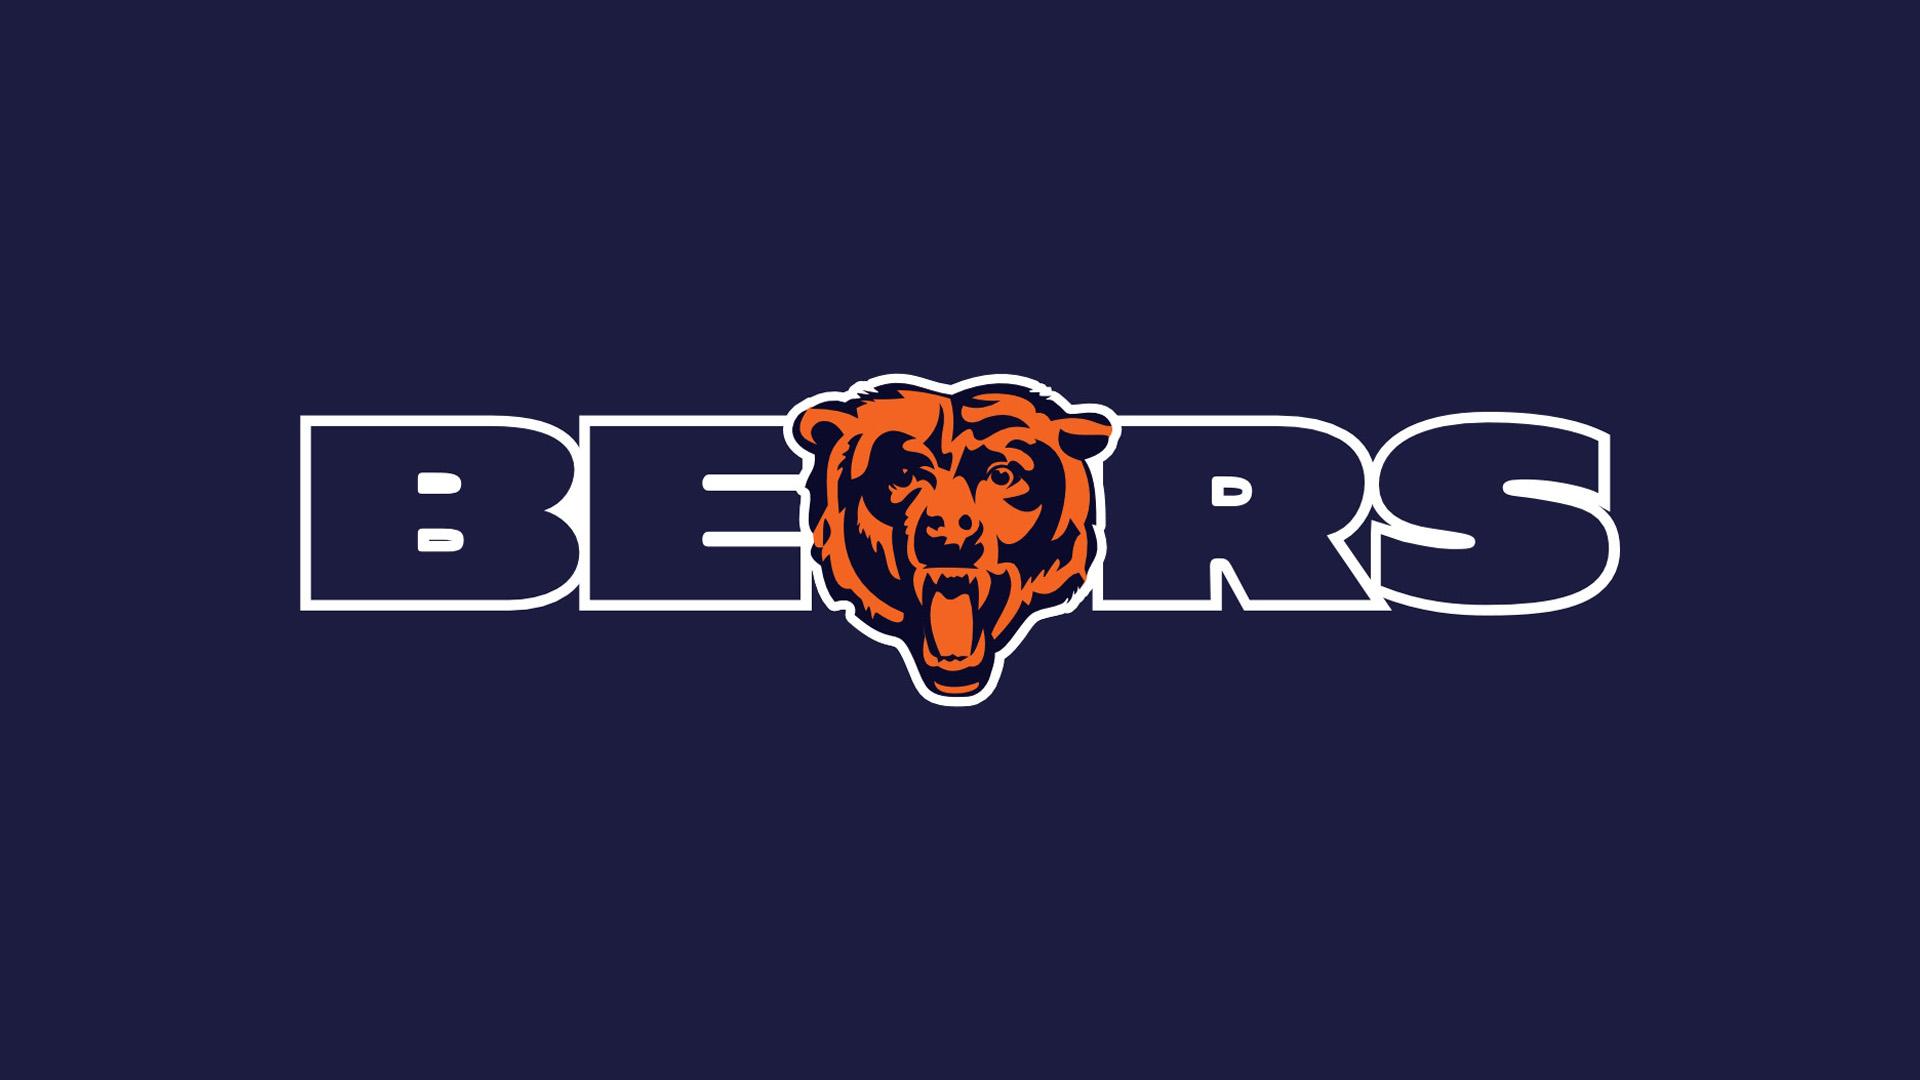 Chicago Bears HD desktop wallpaper Chicago Bears wallpapers 1920x1080